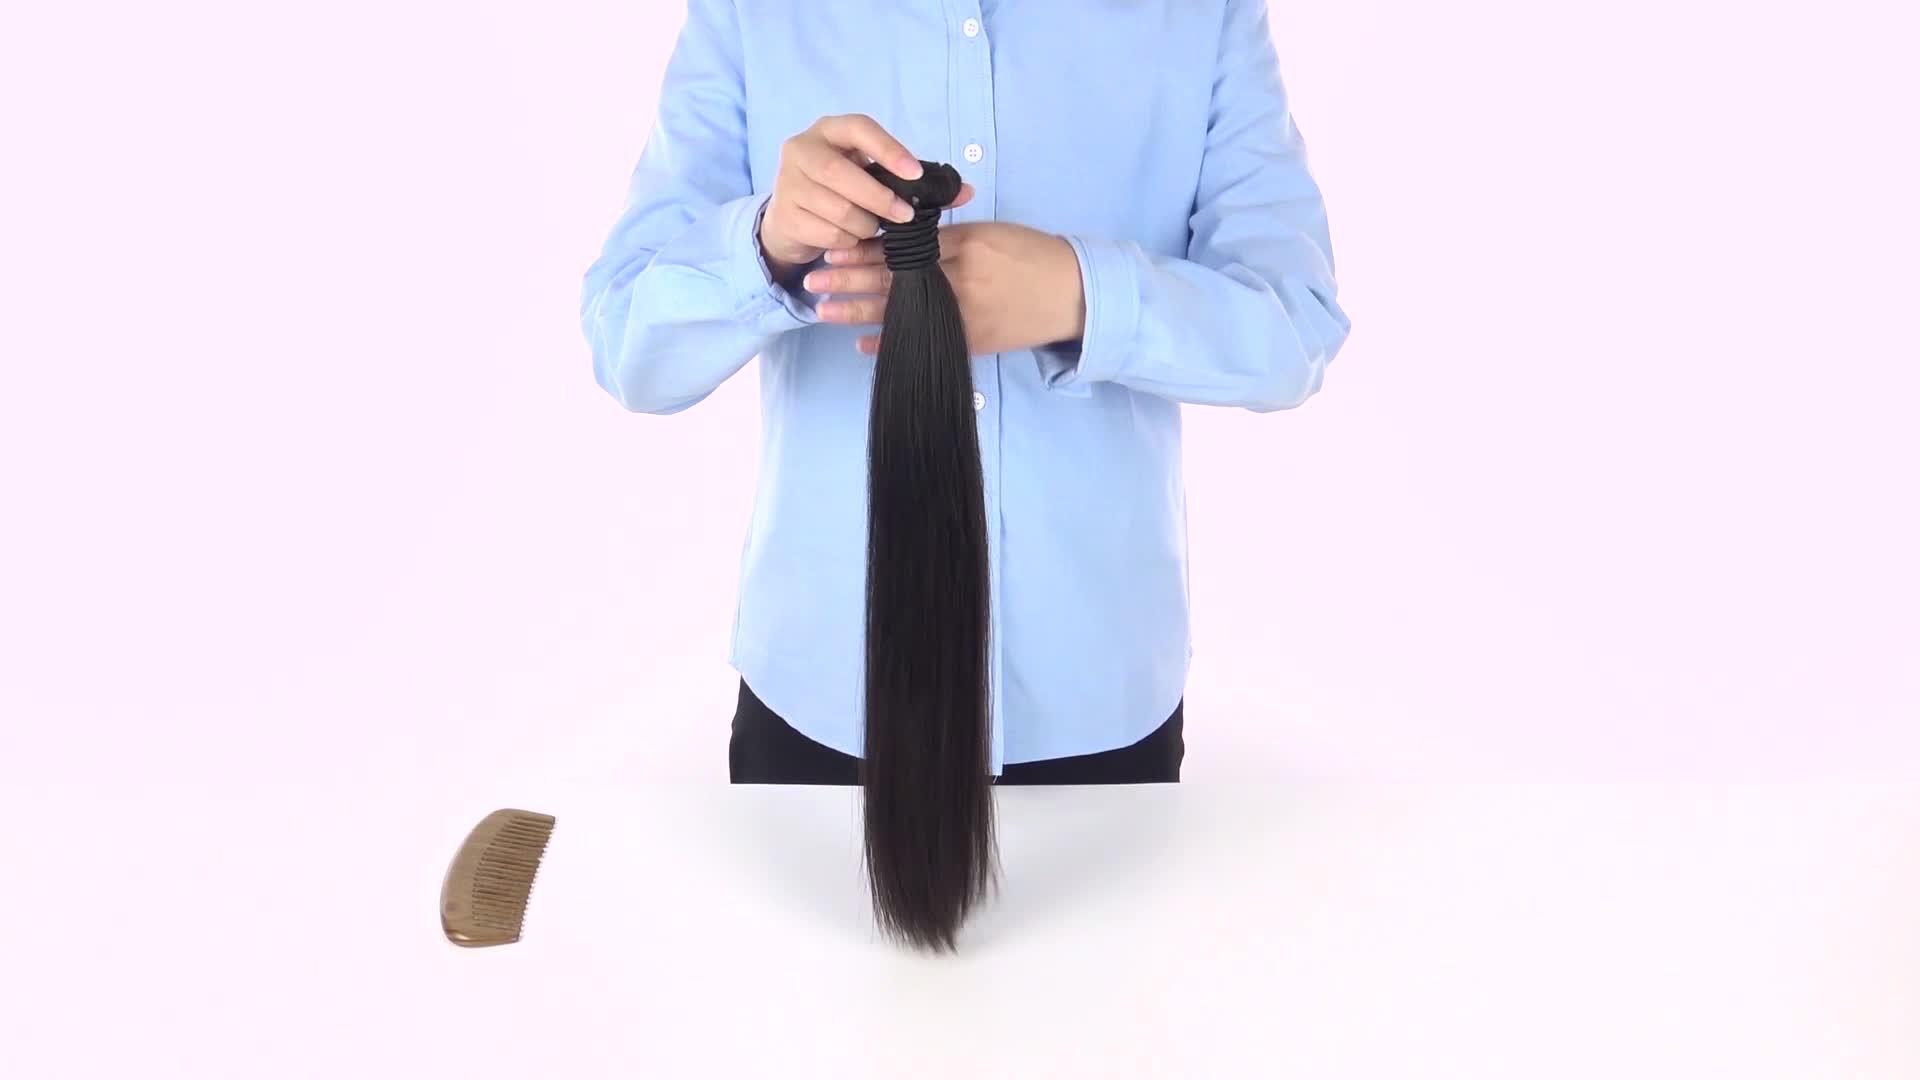 Most popular brazilian bulk hair extensions without weft,bundle hair vendors,free weave hair packs brazilian darling human hair